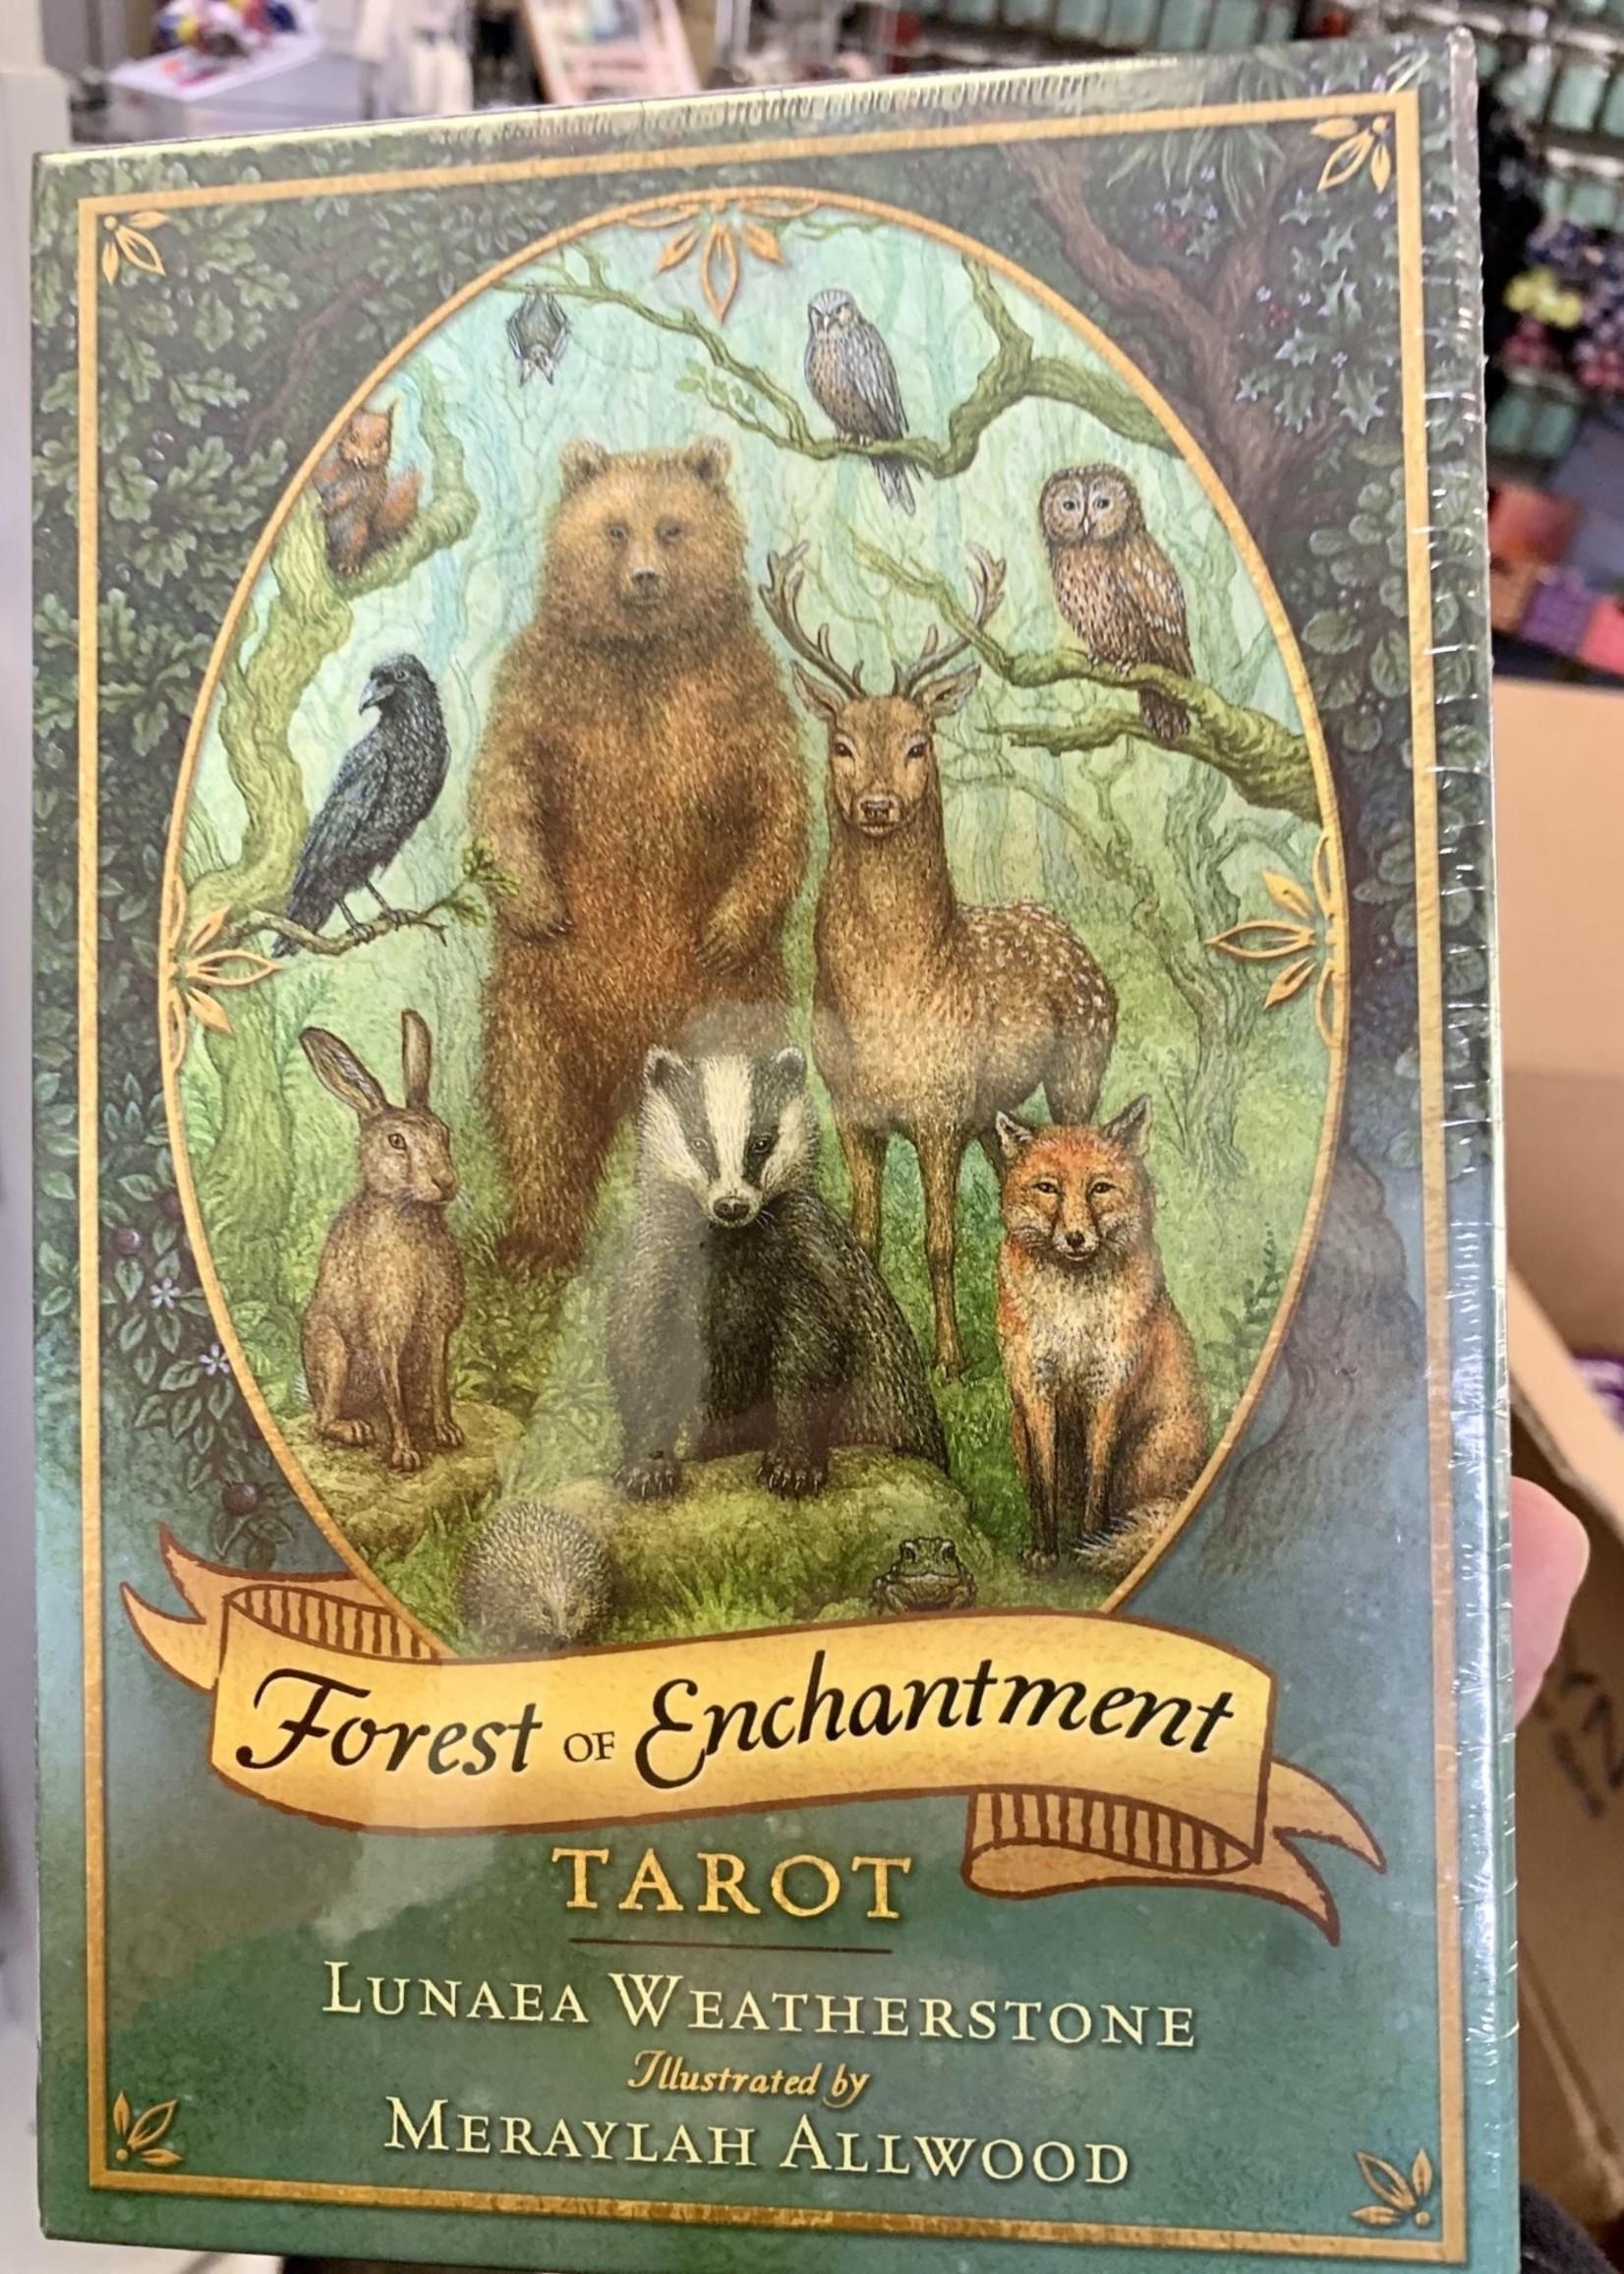 Forest of Enchantment Tarot - BY LUNAEA WEATHERSTONE, MERAYLAH ALLWOOD